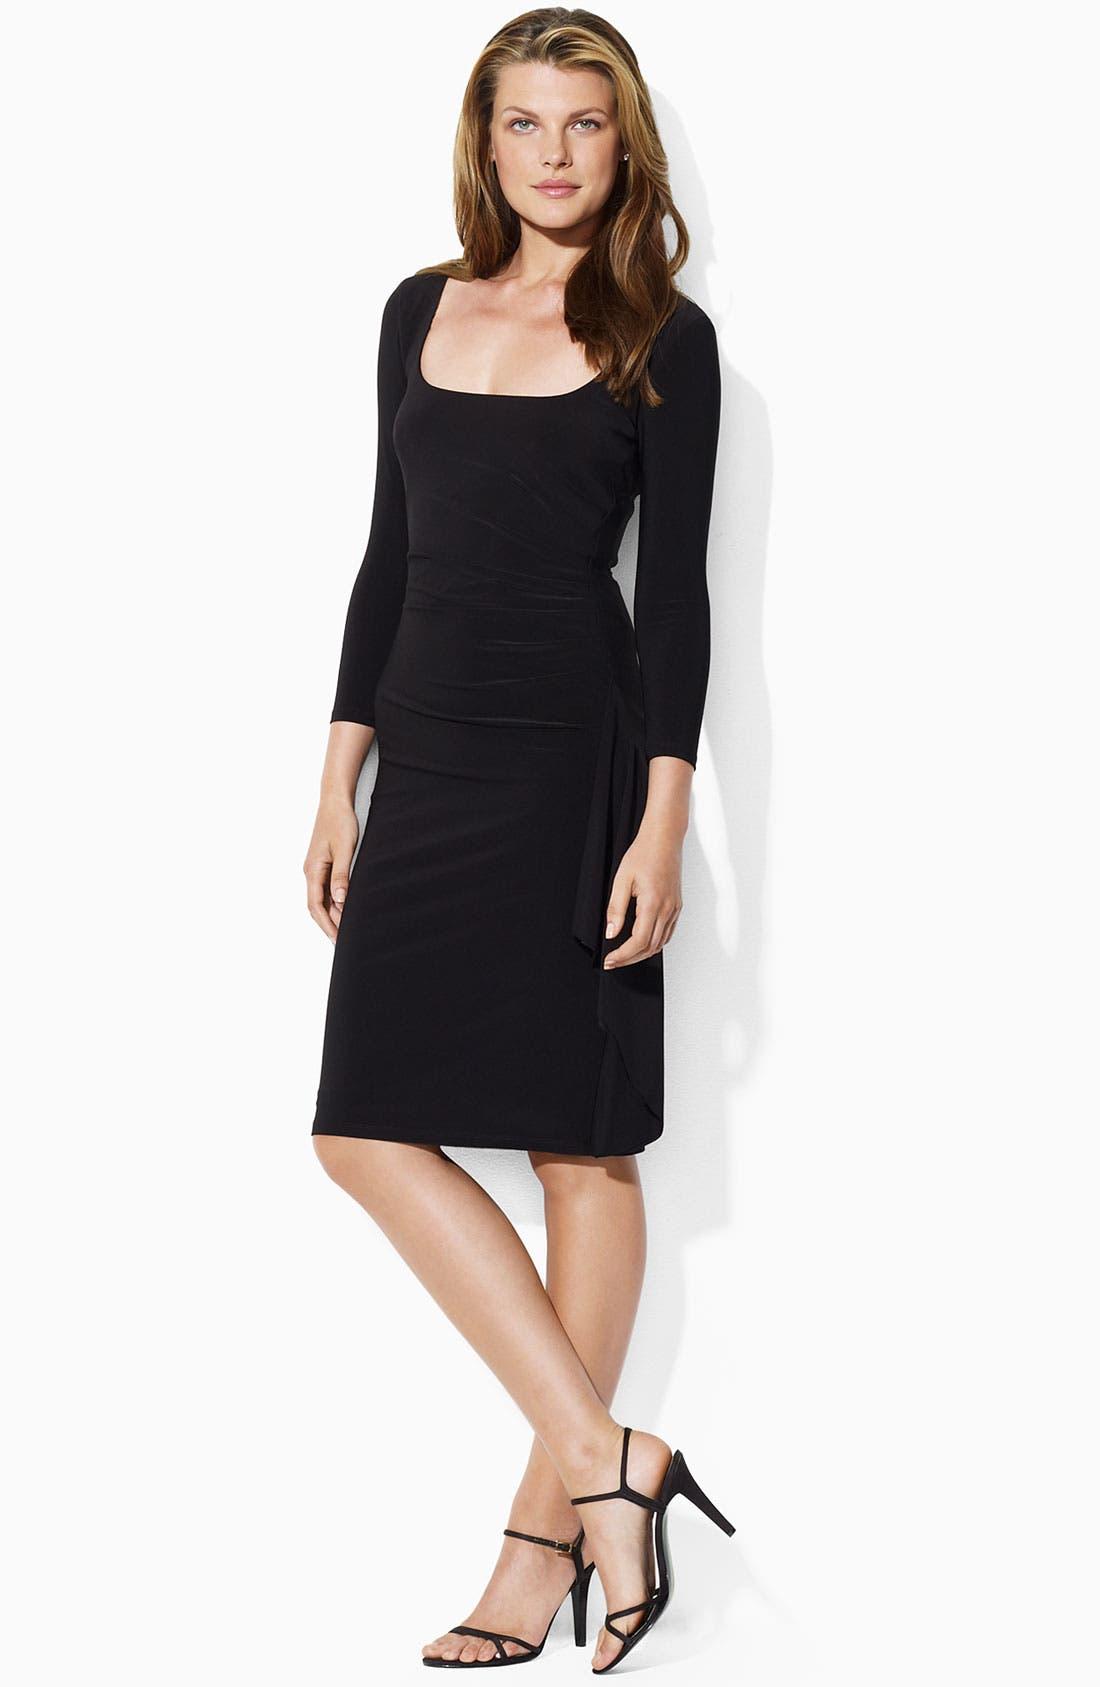 Alternate Image 1 Selected - Lauren by Ralph Lauren 'Lambert' Jersey Dress